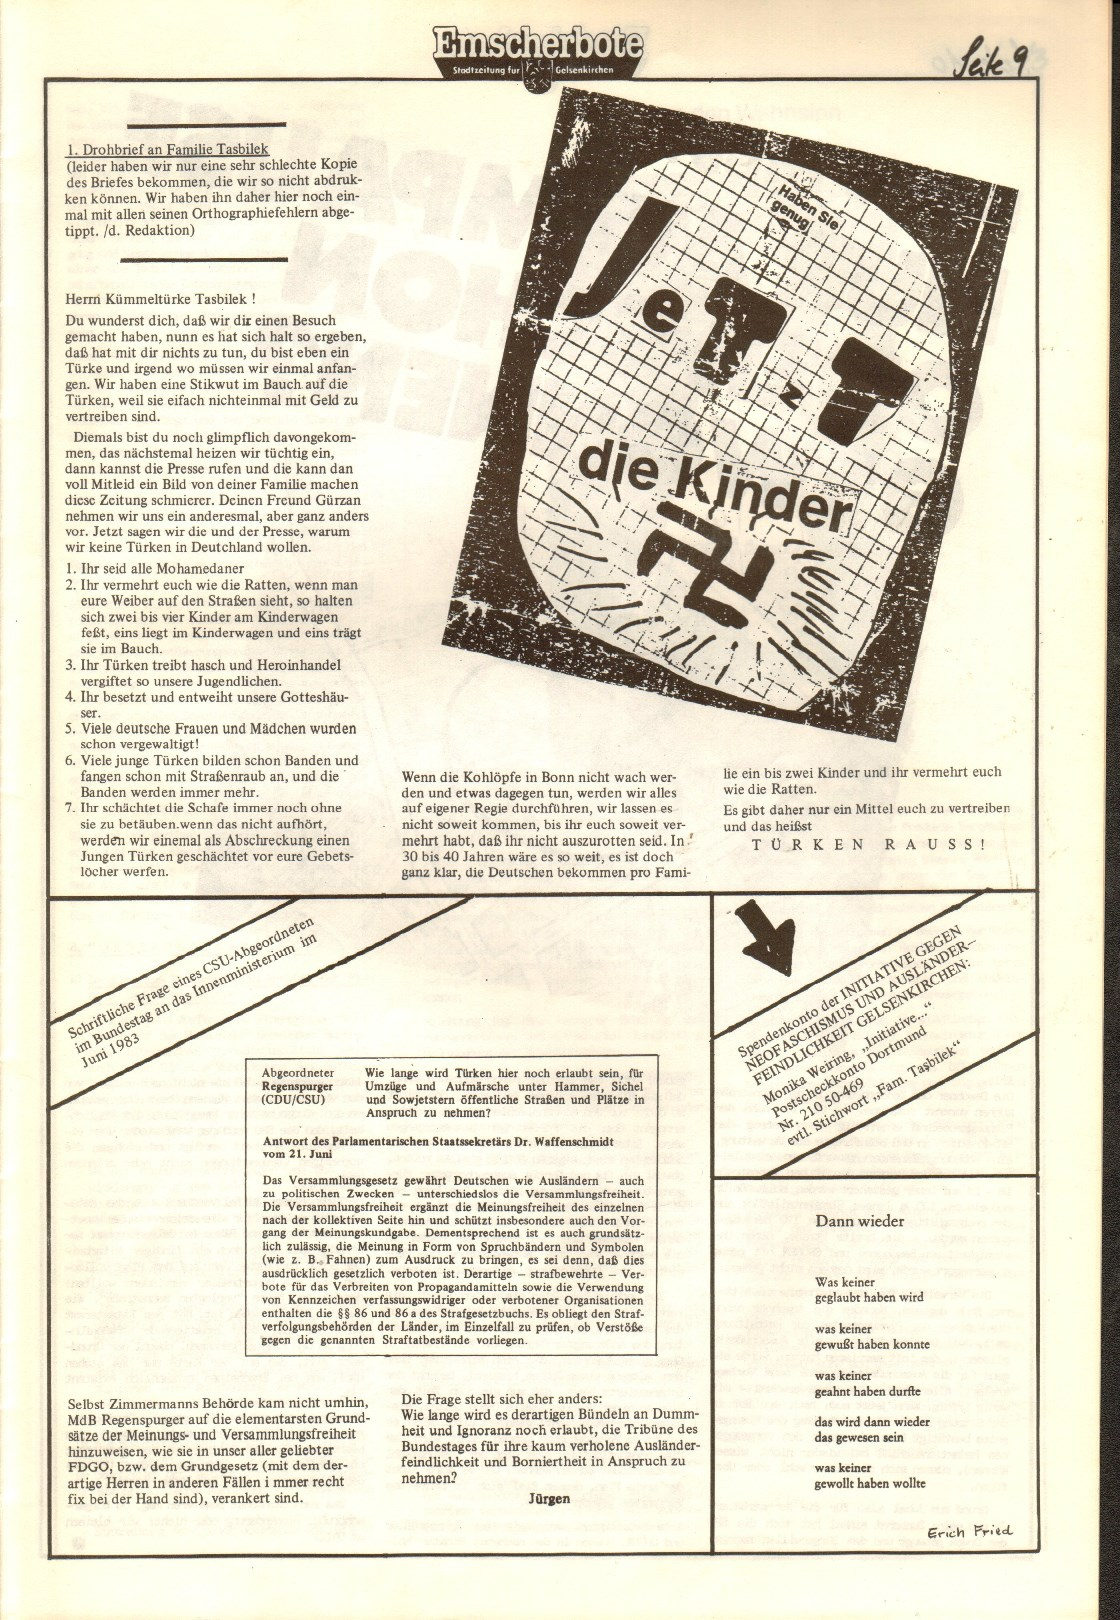 Gelsenkirchen_Emscherbote_1983_33_09